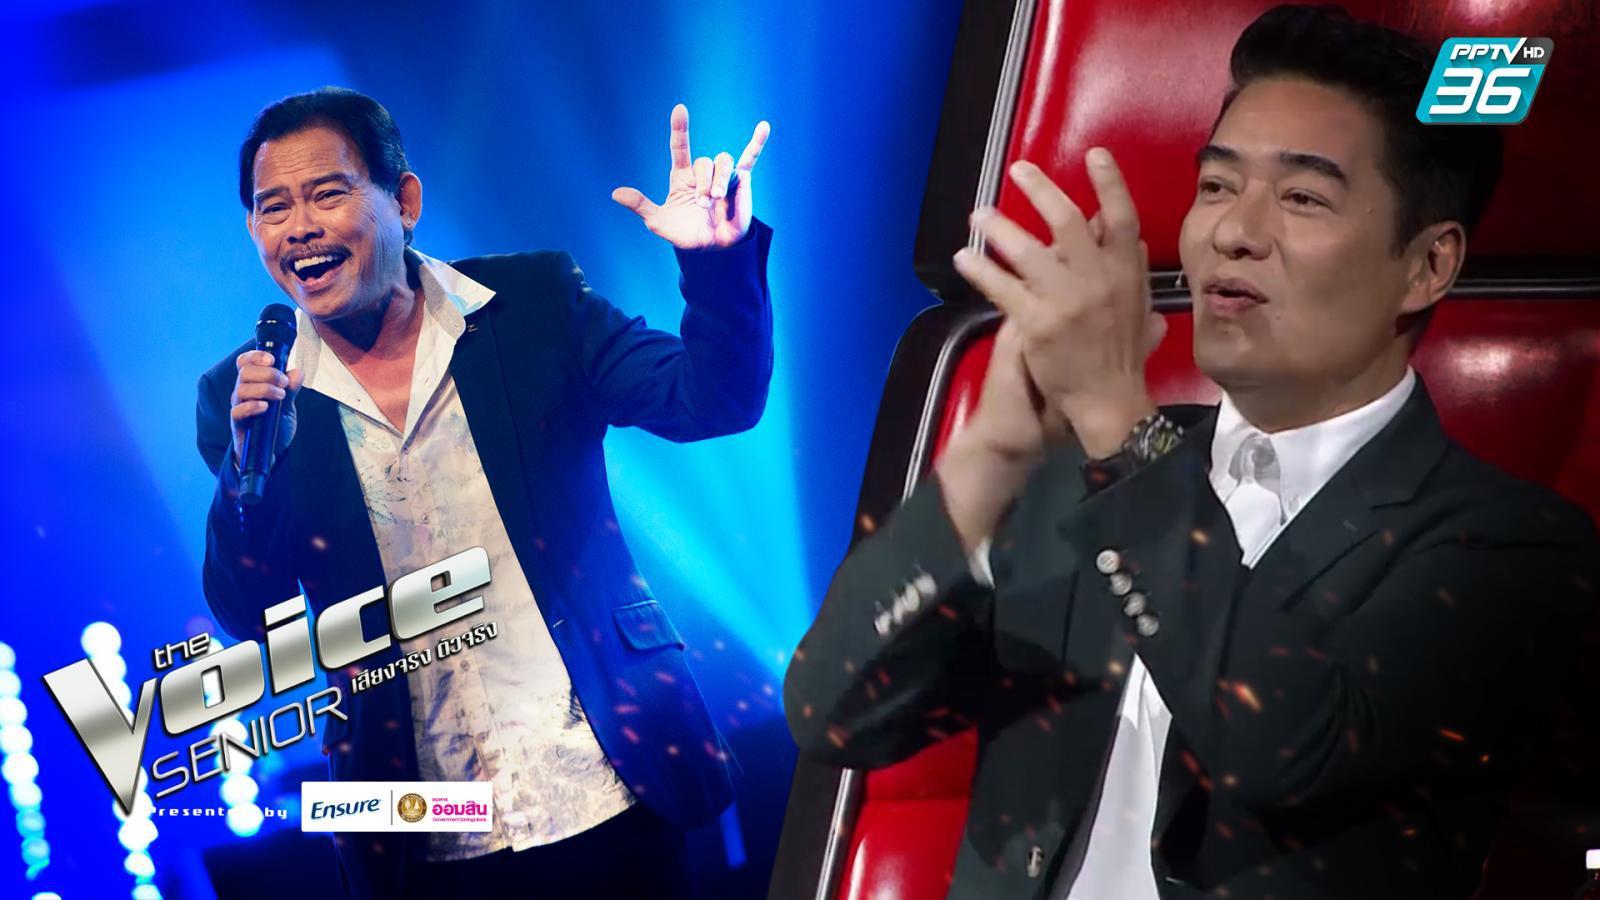 The Voice Senior 2020 | EP.2 | มือกลองวงดังระดับตำนาน โชว์เก๋าร้องเพลงสุดทึ่ง!